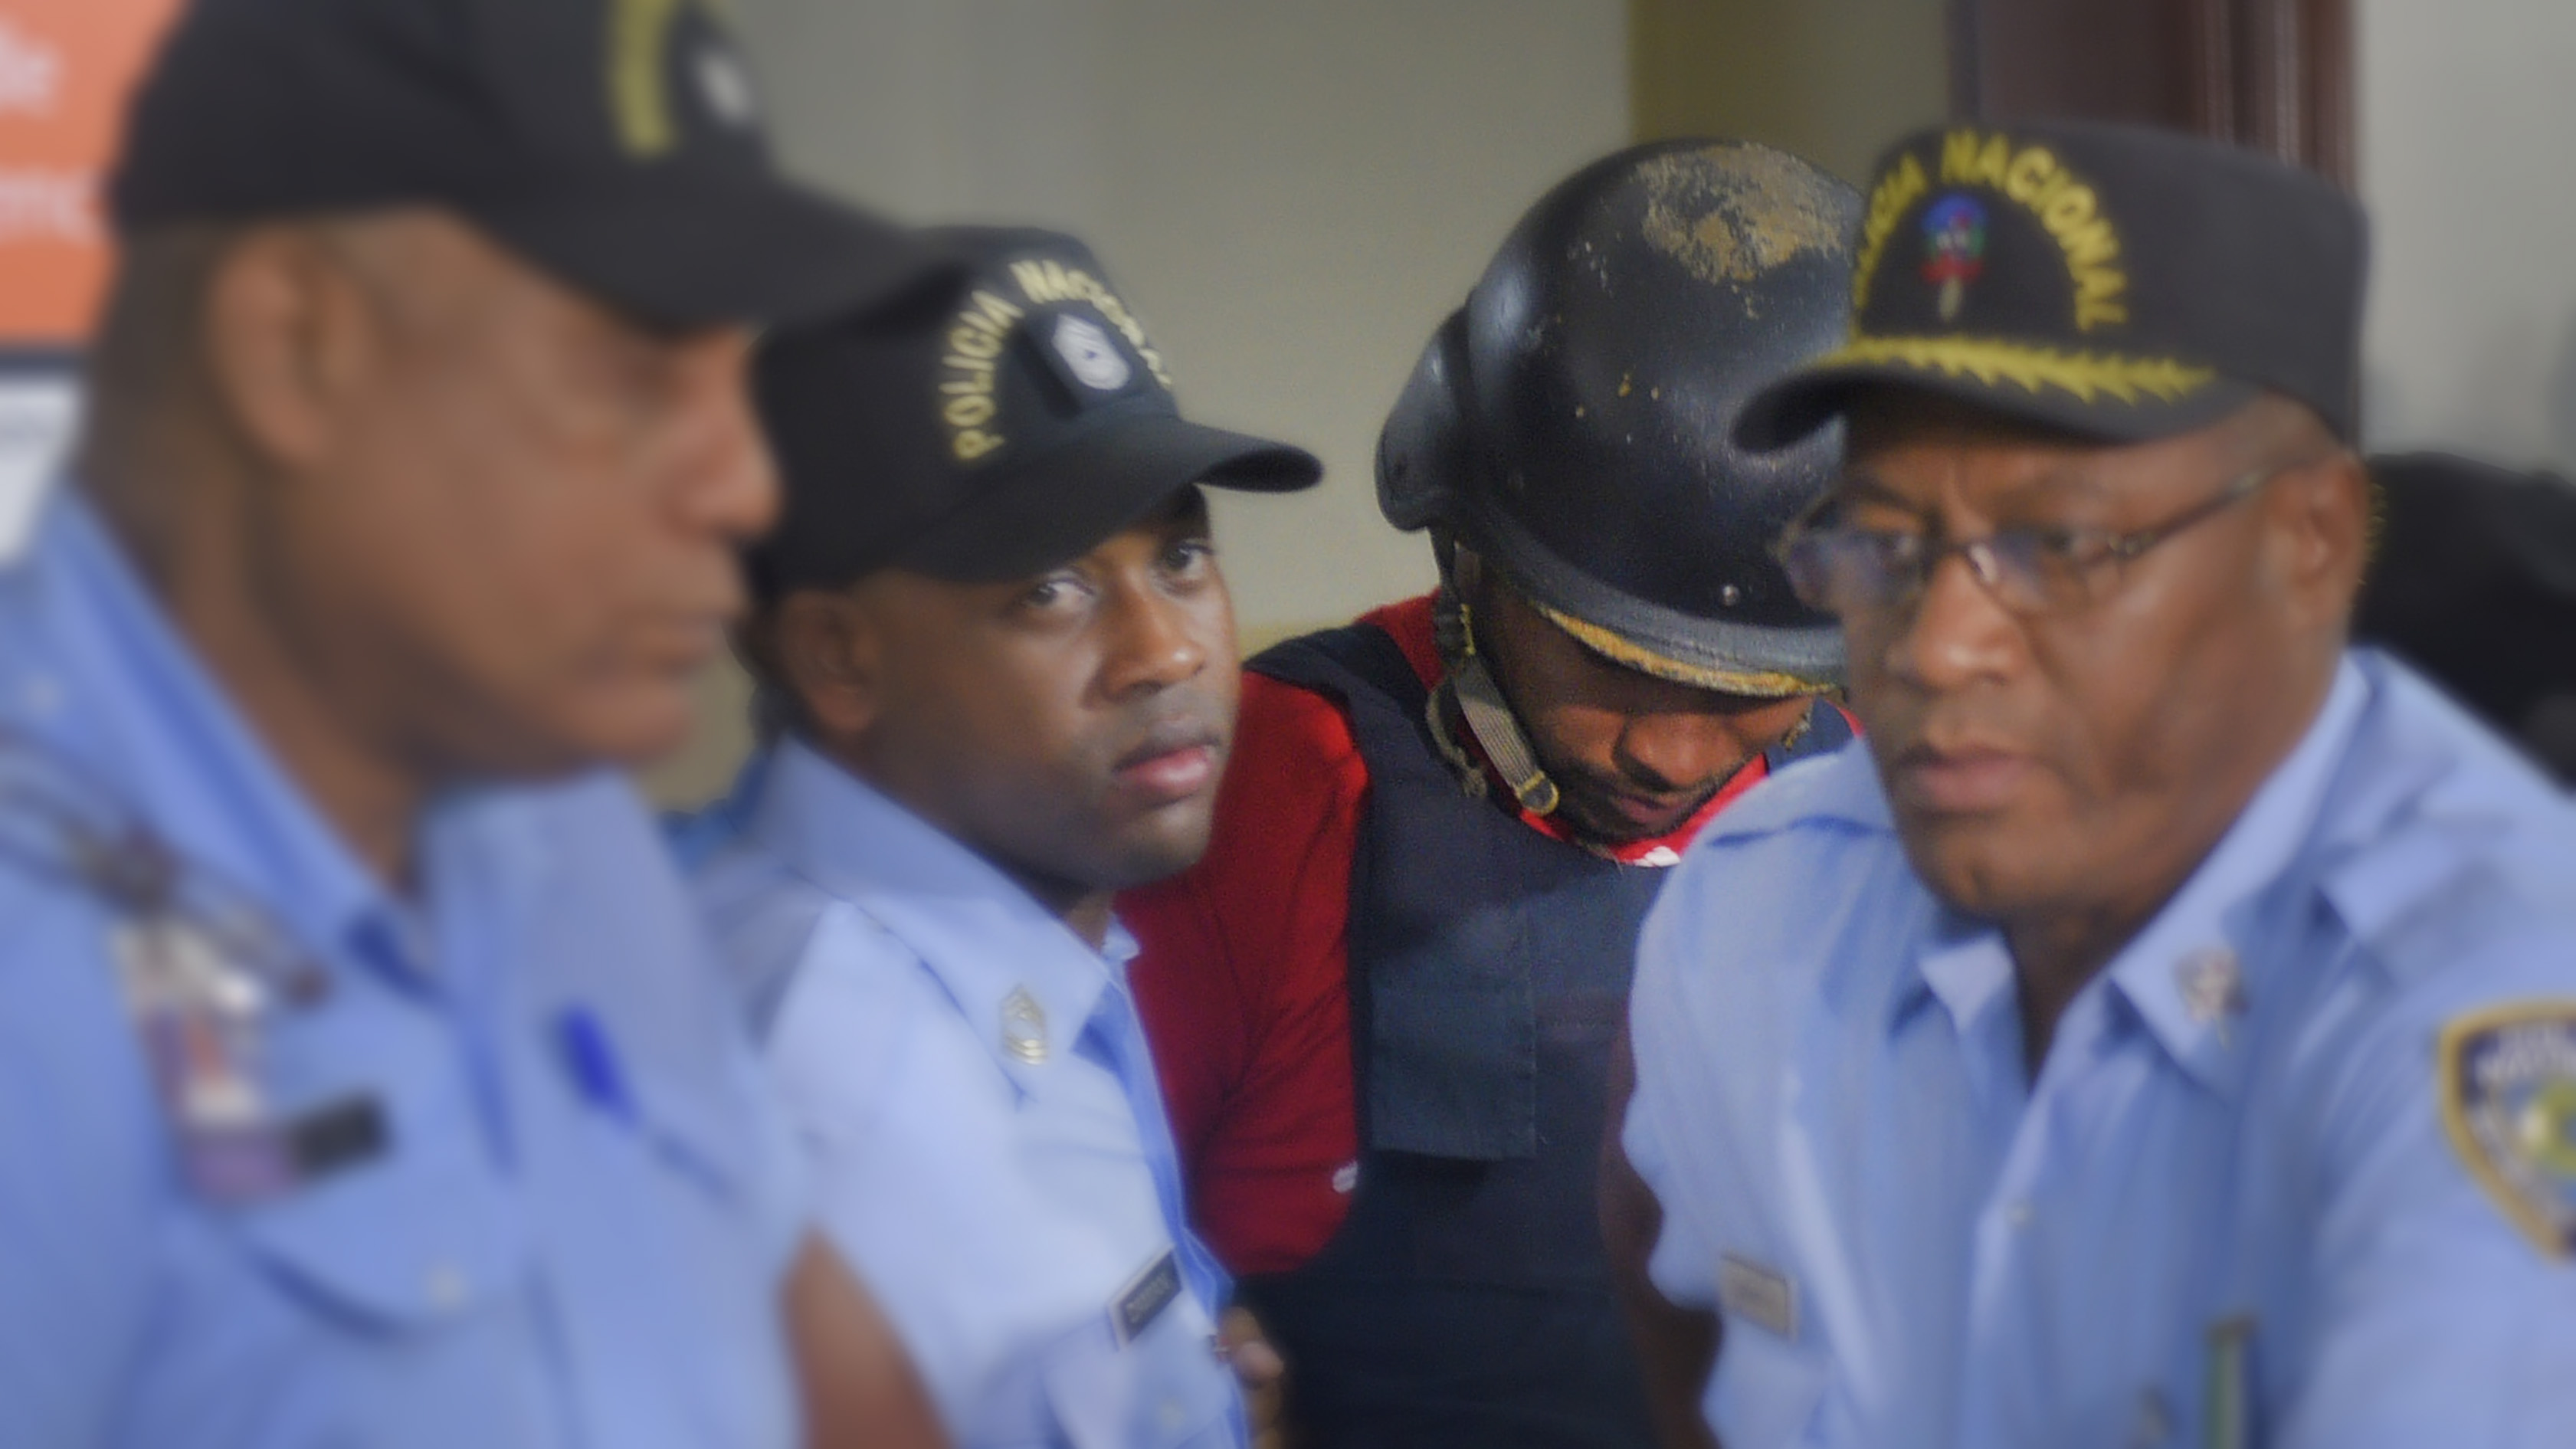 El drama no termina: arrestan a un décimo sospechoso del ataque a David Ortiz